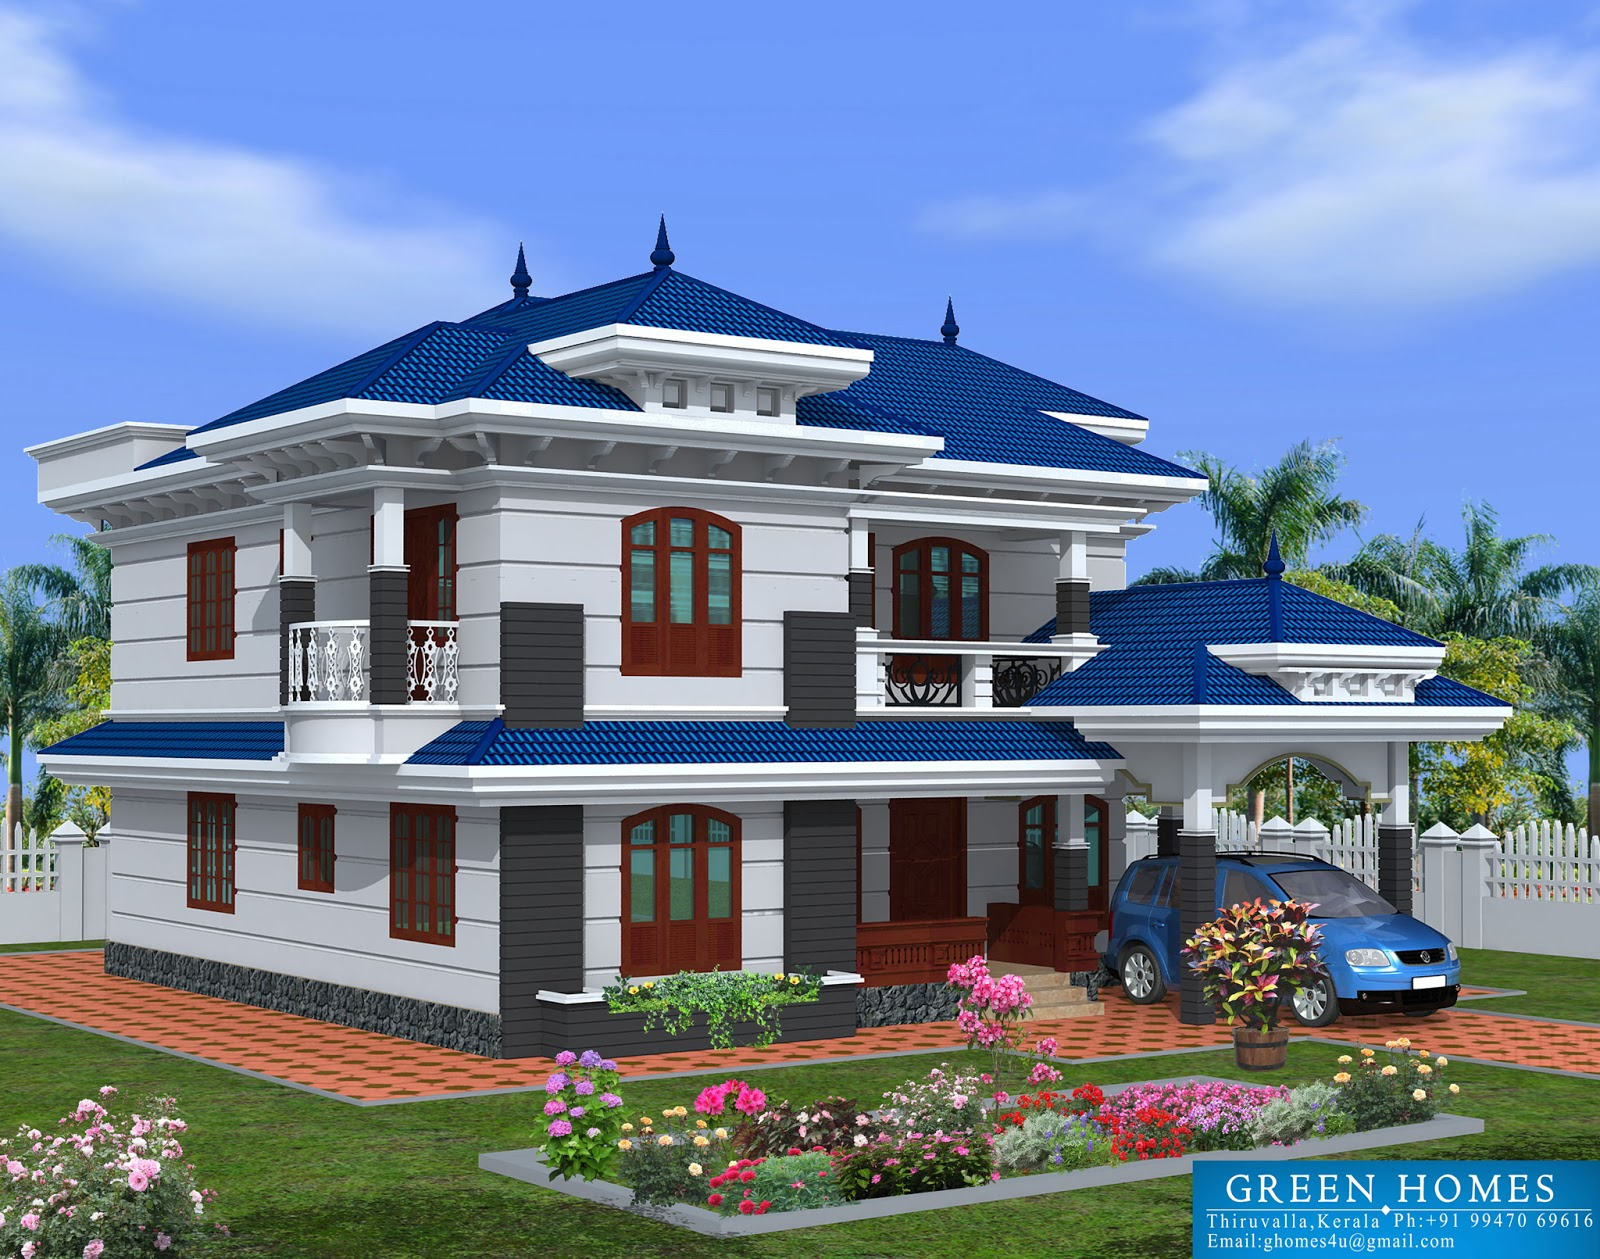 square yards kerala model home design green homes thiruvalla kerala october kerala home design floor plans